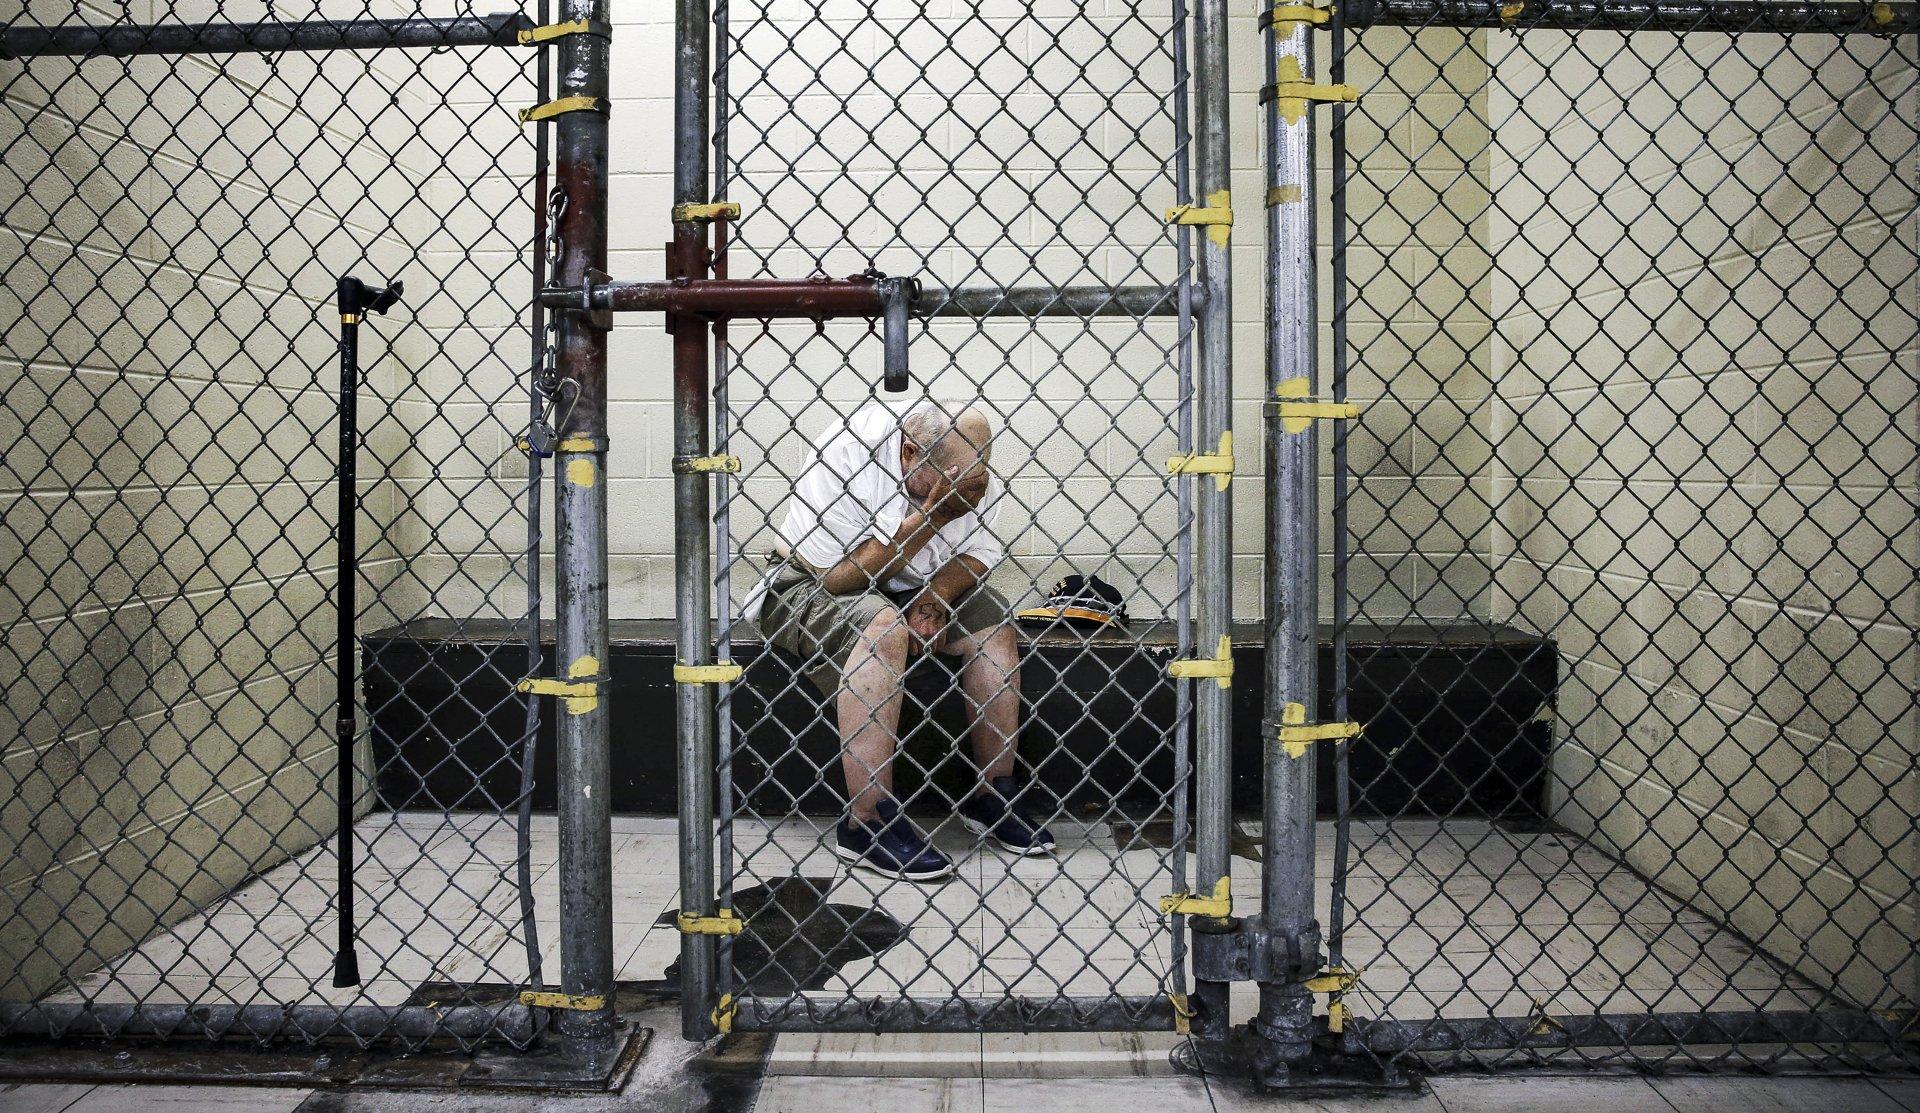 America' Largest Mental Hospital Jail - Atlantic